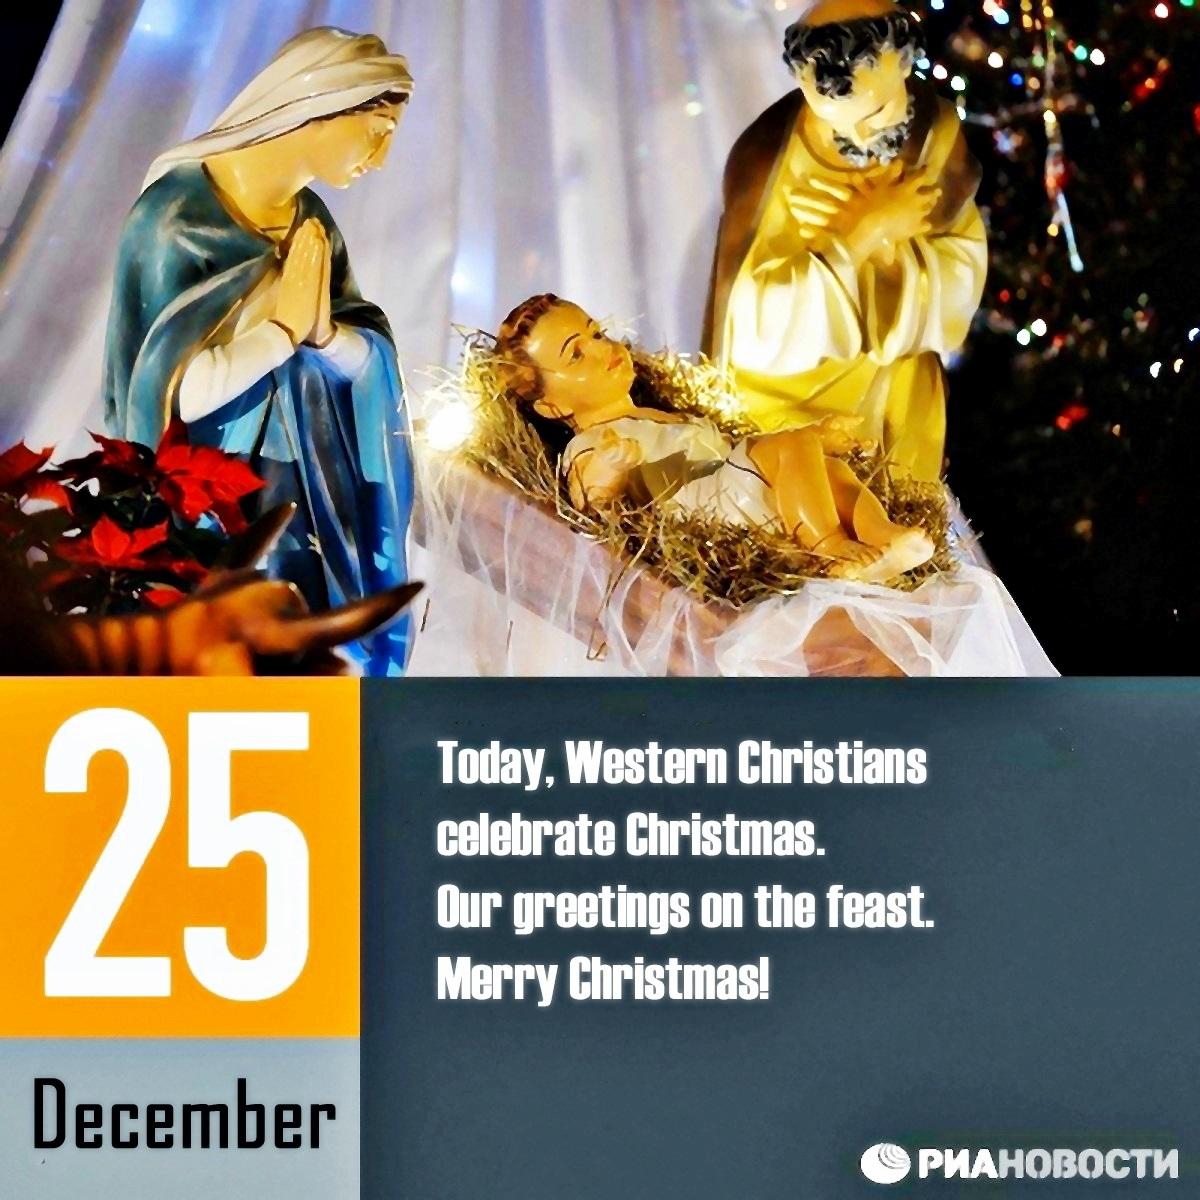 00 ria-novosti 25 december christmas 251215